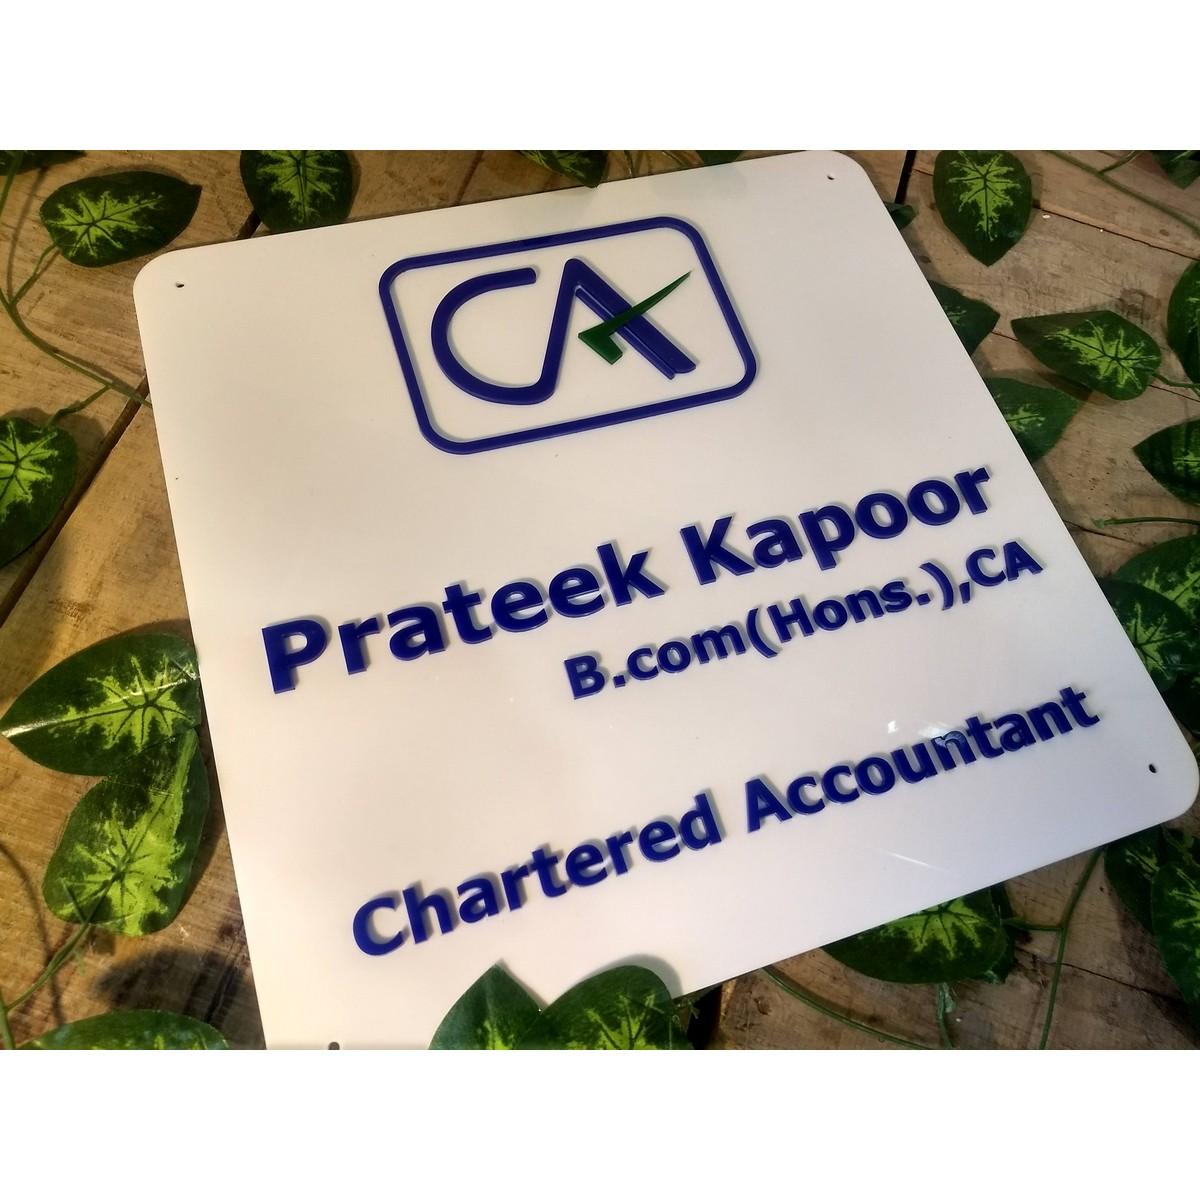 Chartered Accountant Weatherproof Name Plate  Chartered Accountant Weatherproof Name Plate 2